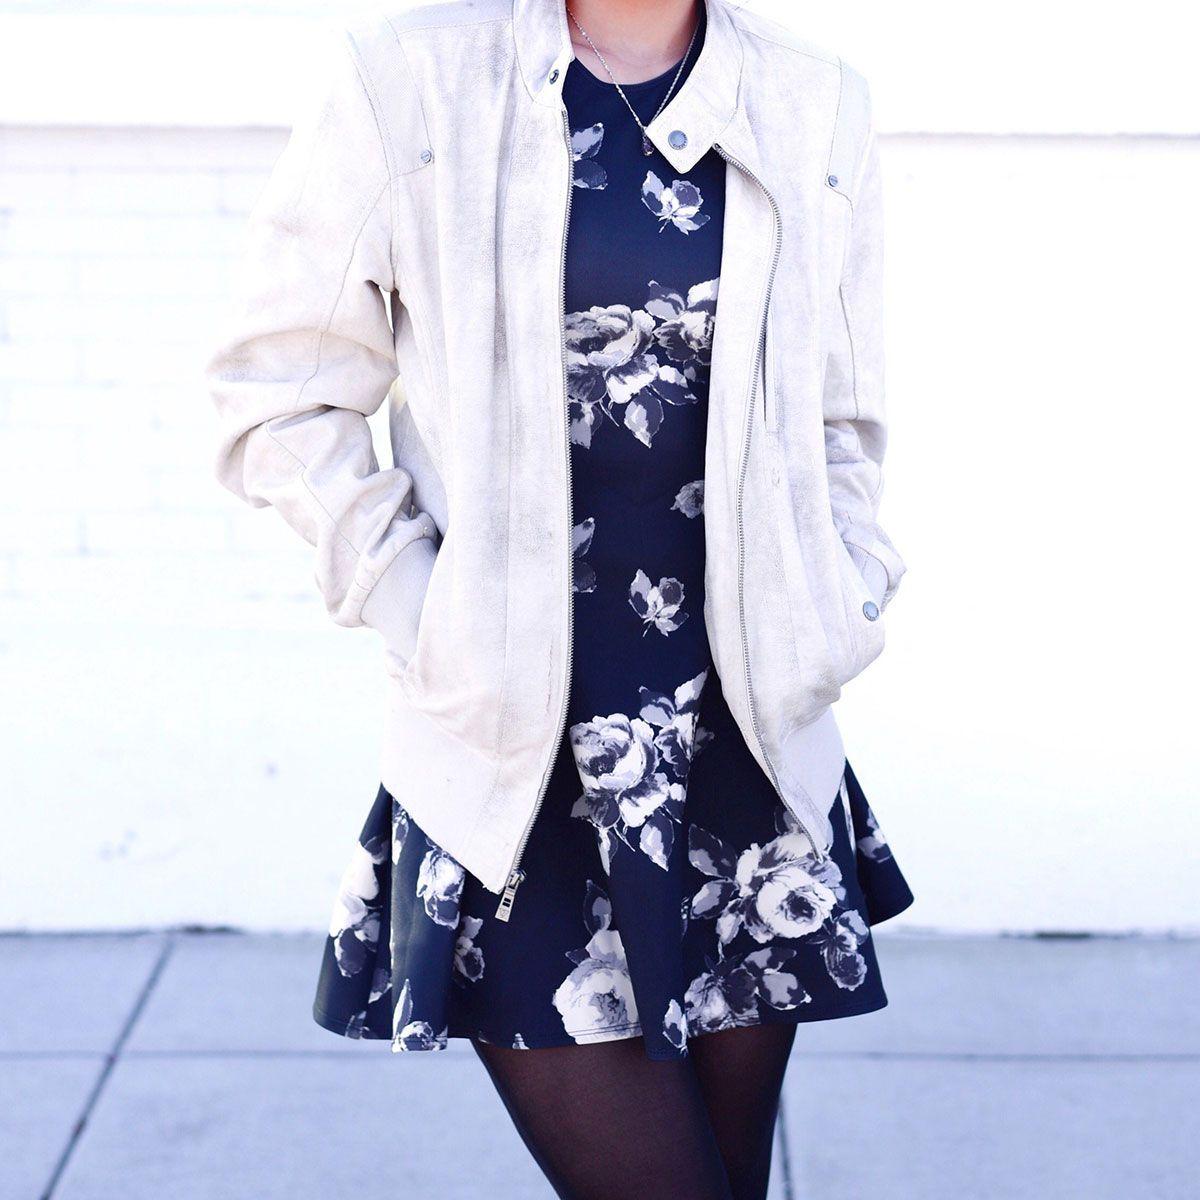 Grunge God Savannah Belle English never lacks sexy sophistication // #punk #grunge #edgy #style #fashionblogger #styleexpert